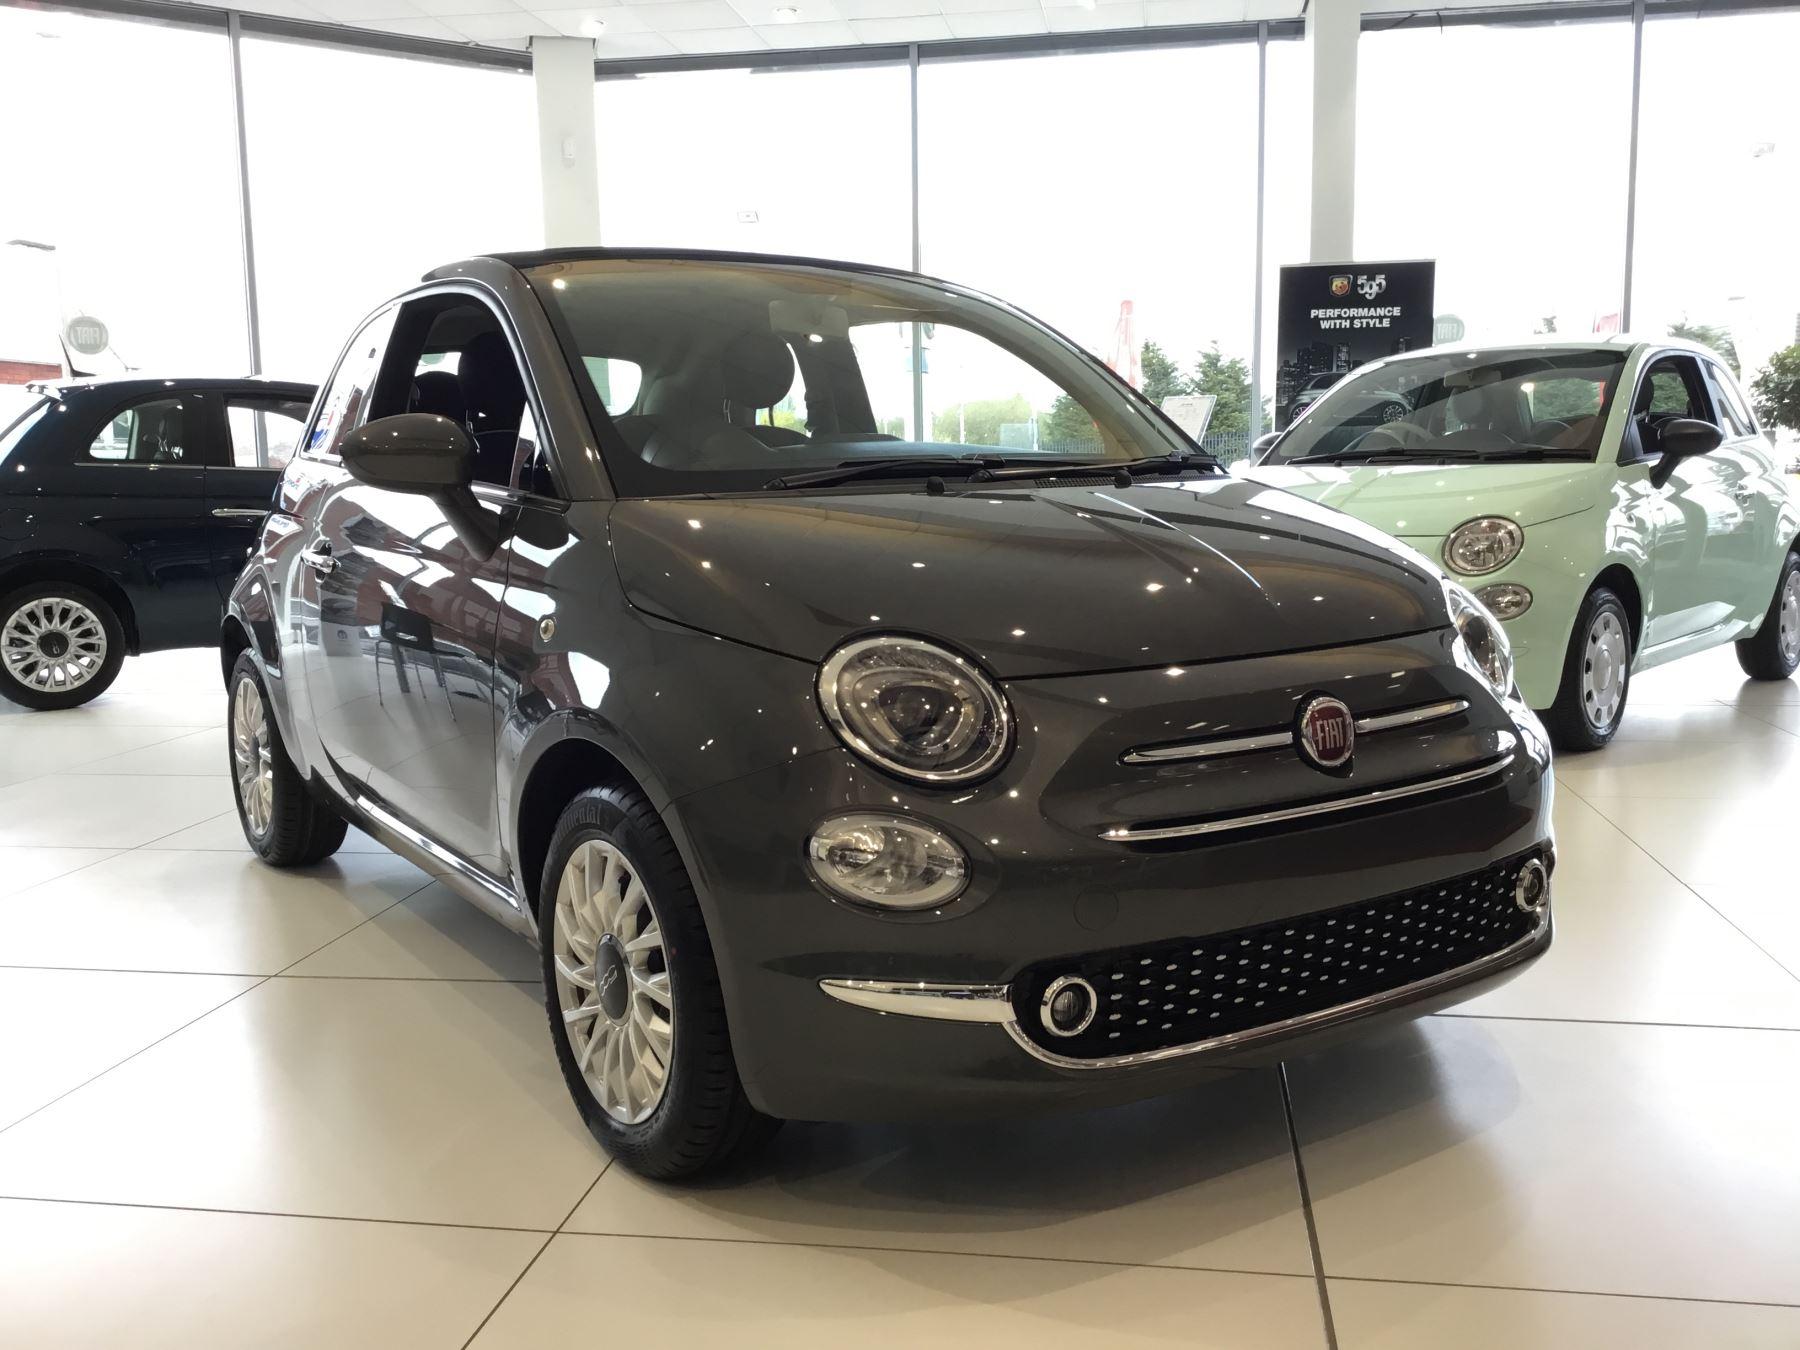 Fiat 500 1.2 Lounge 2dr image 13